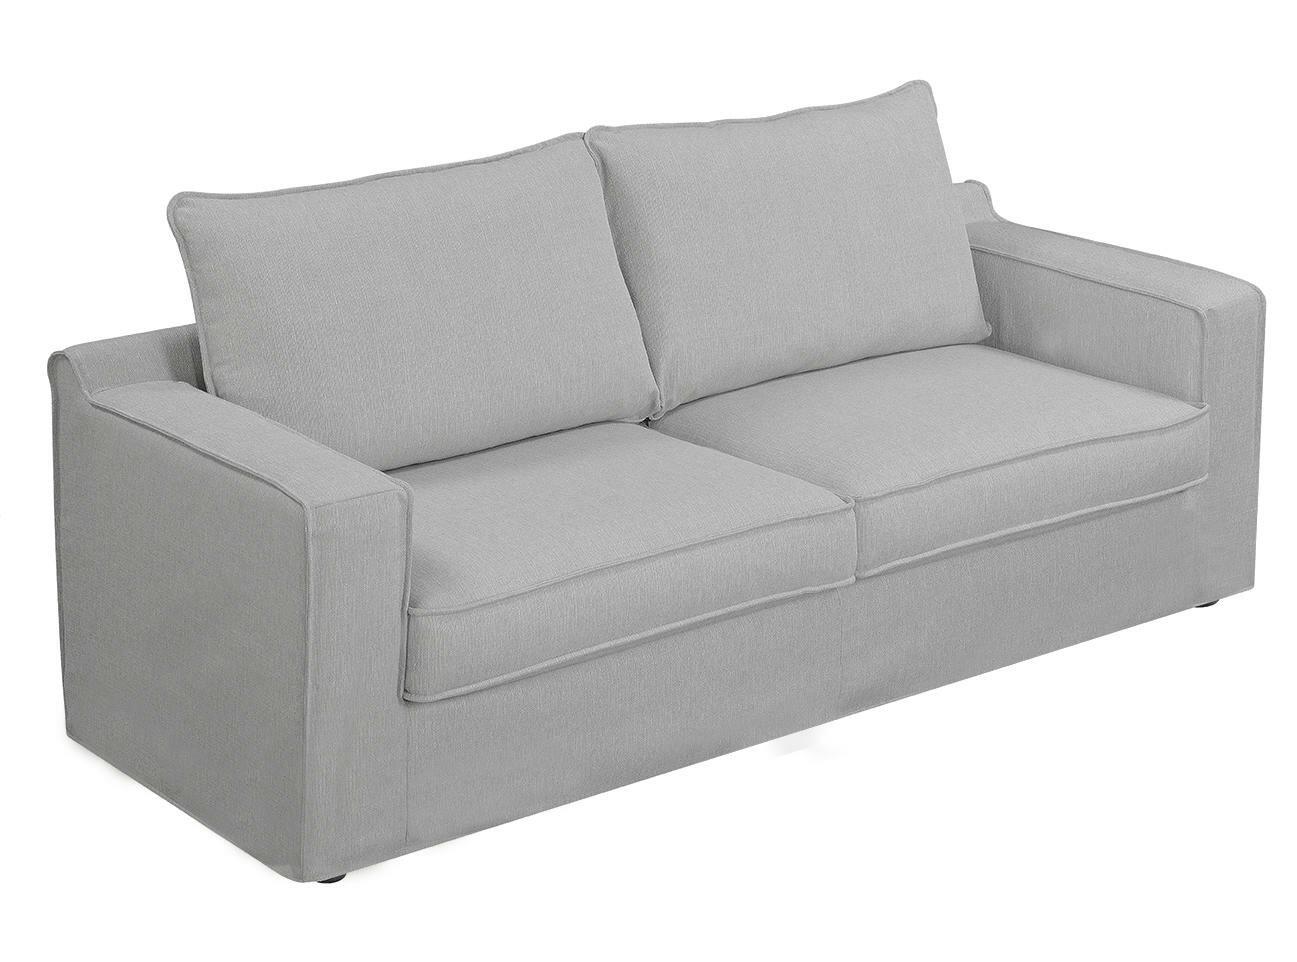 Serta At Home Colton Slipcover Sofa U0026 Reviews | Wayfair